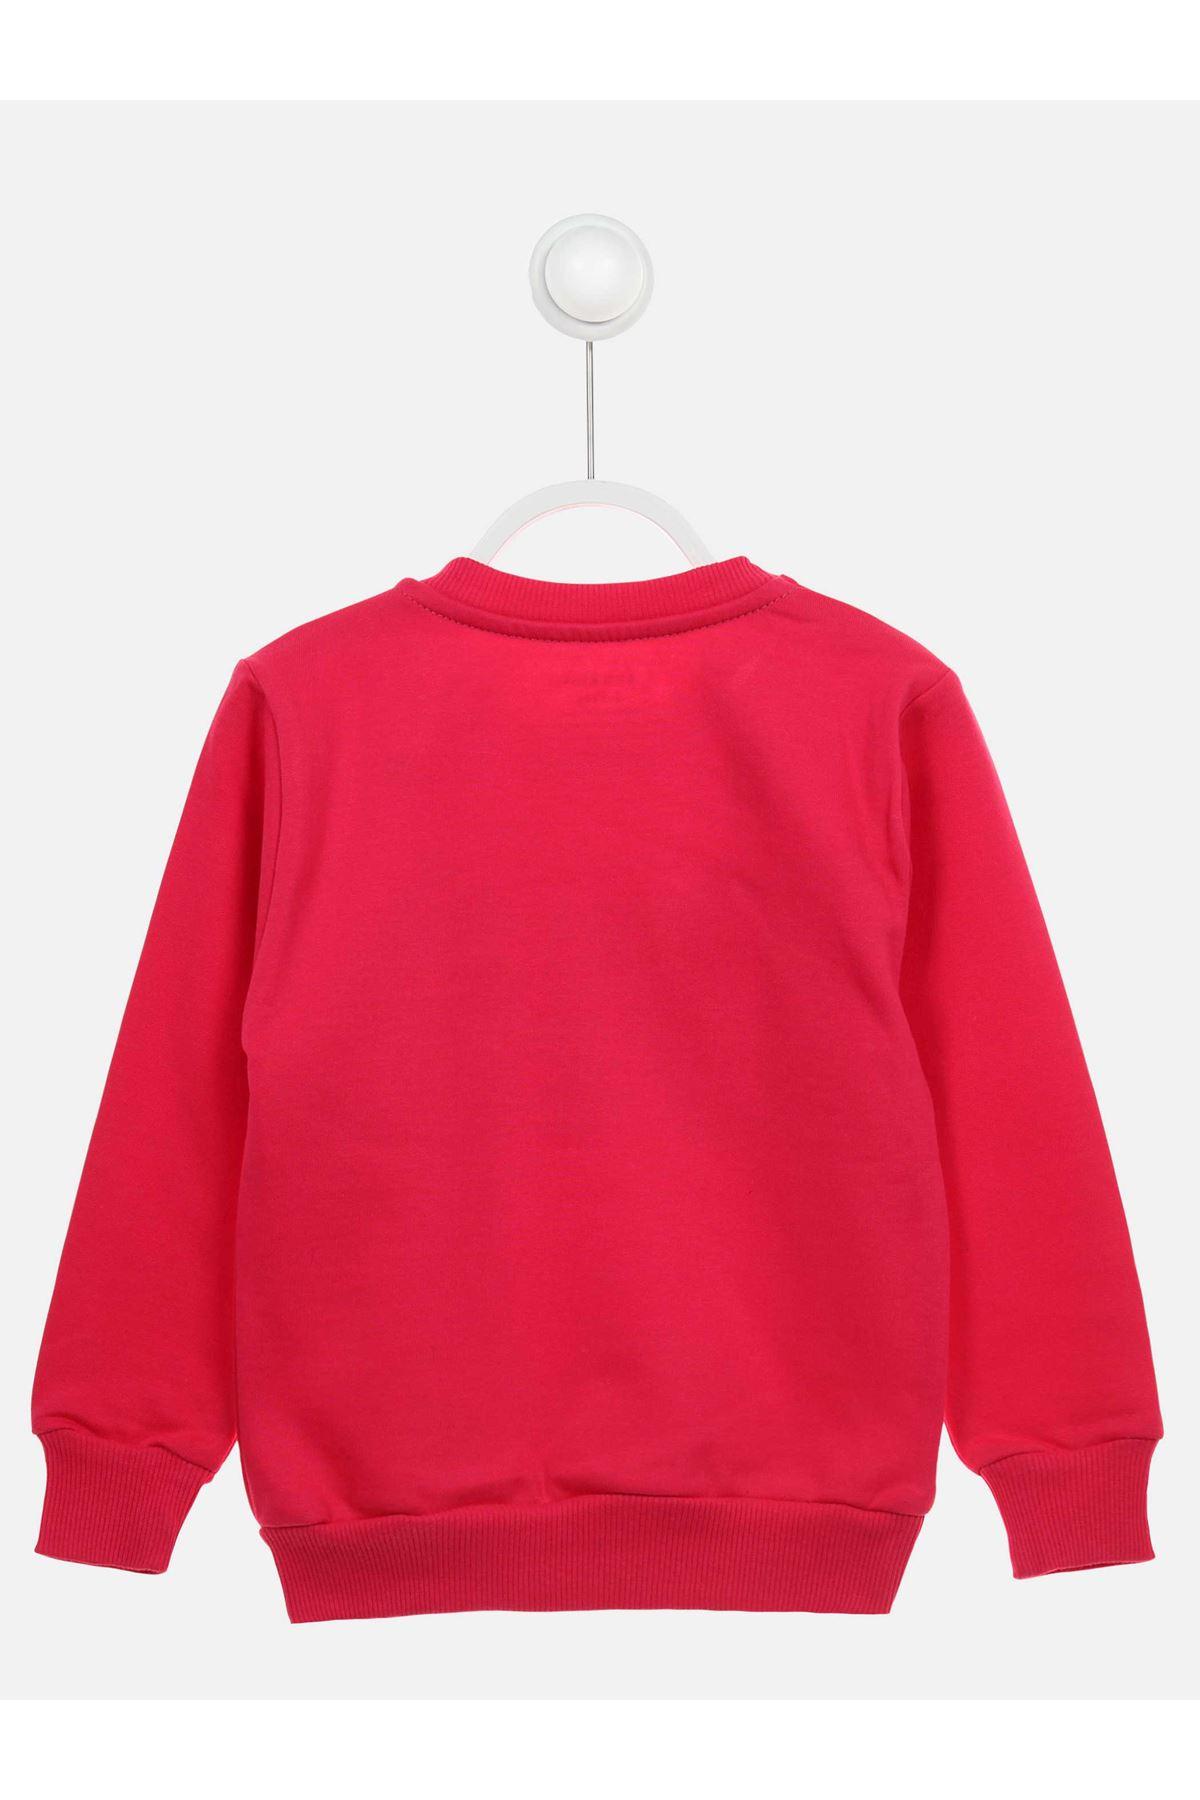 Pomegranate Flower Seasonal Girl Child Sweatshirt